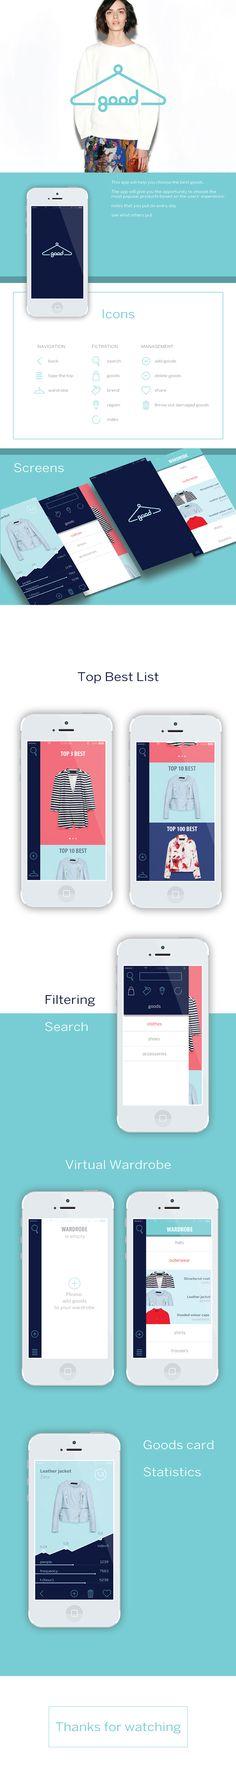 Good - #app #design